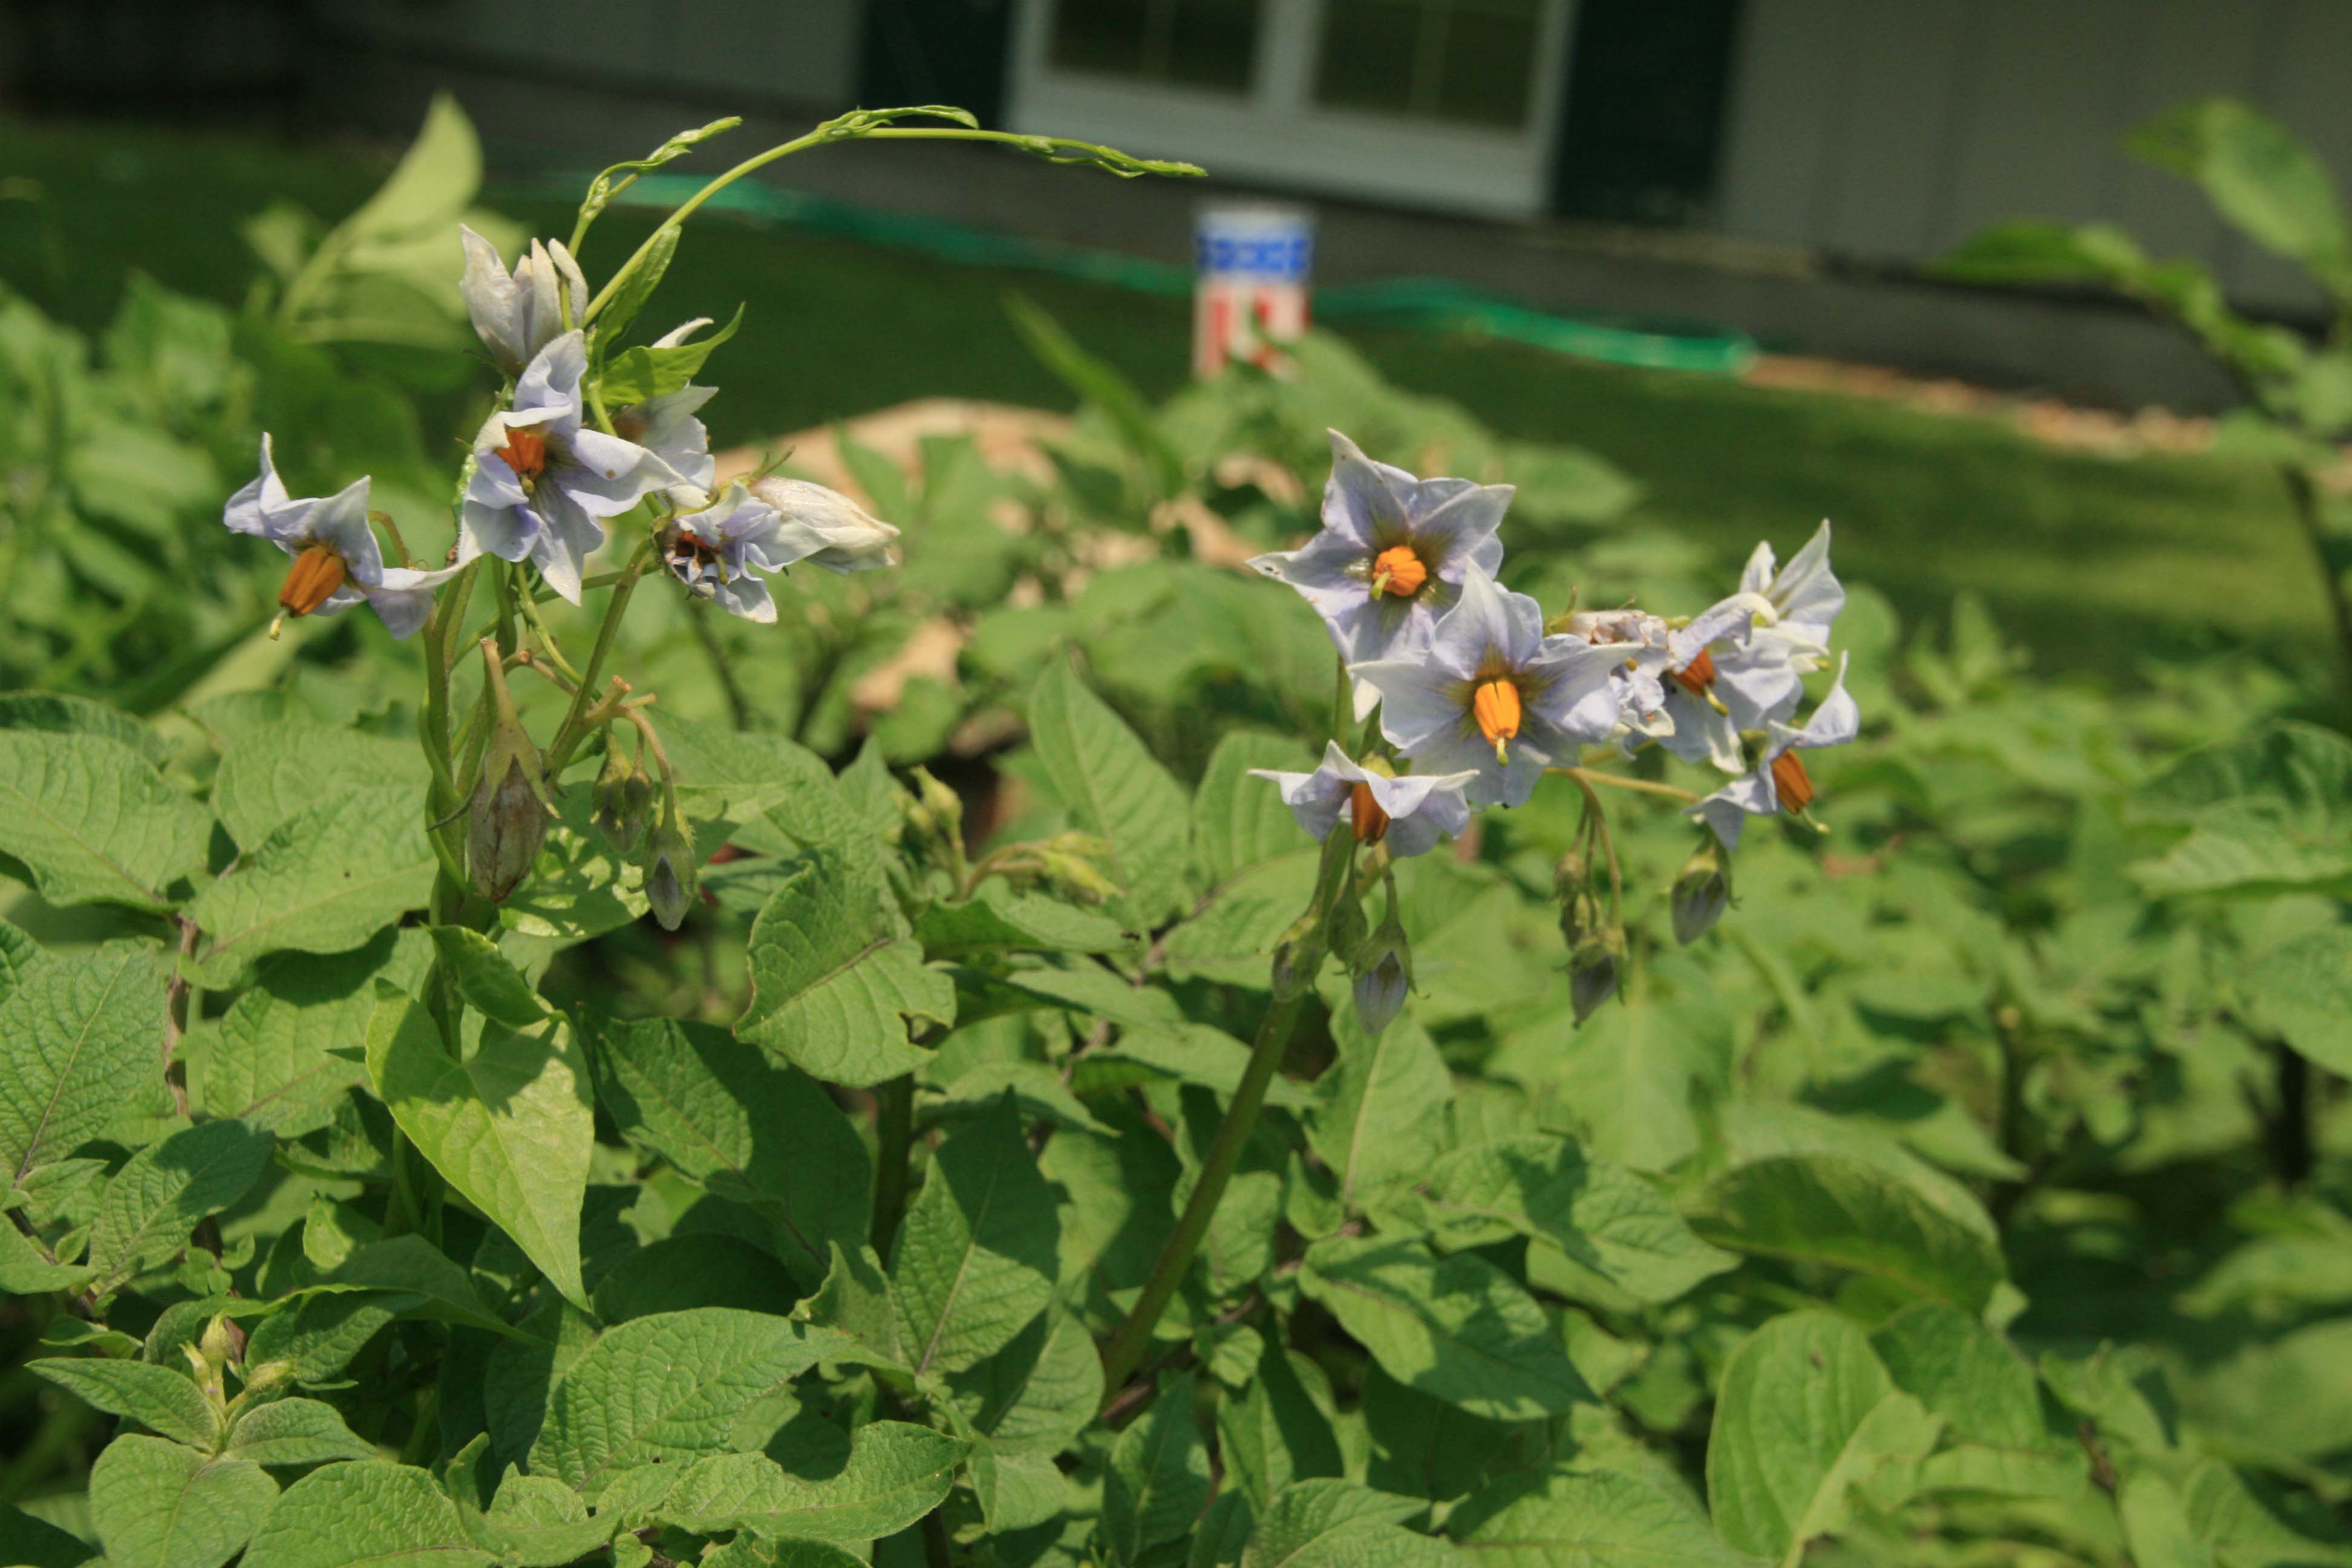 Flowering potato